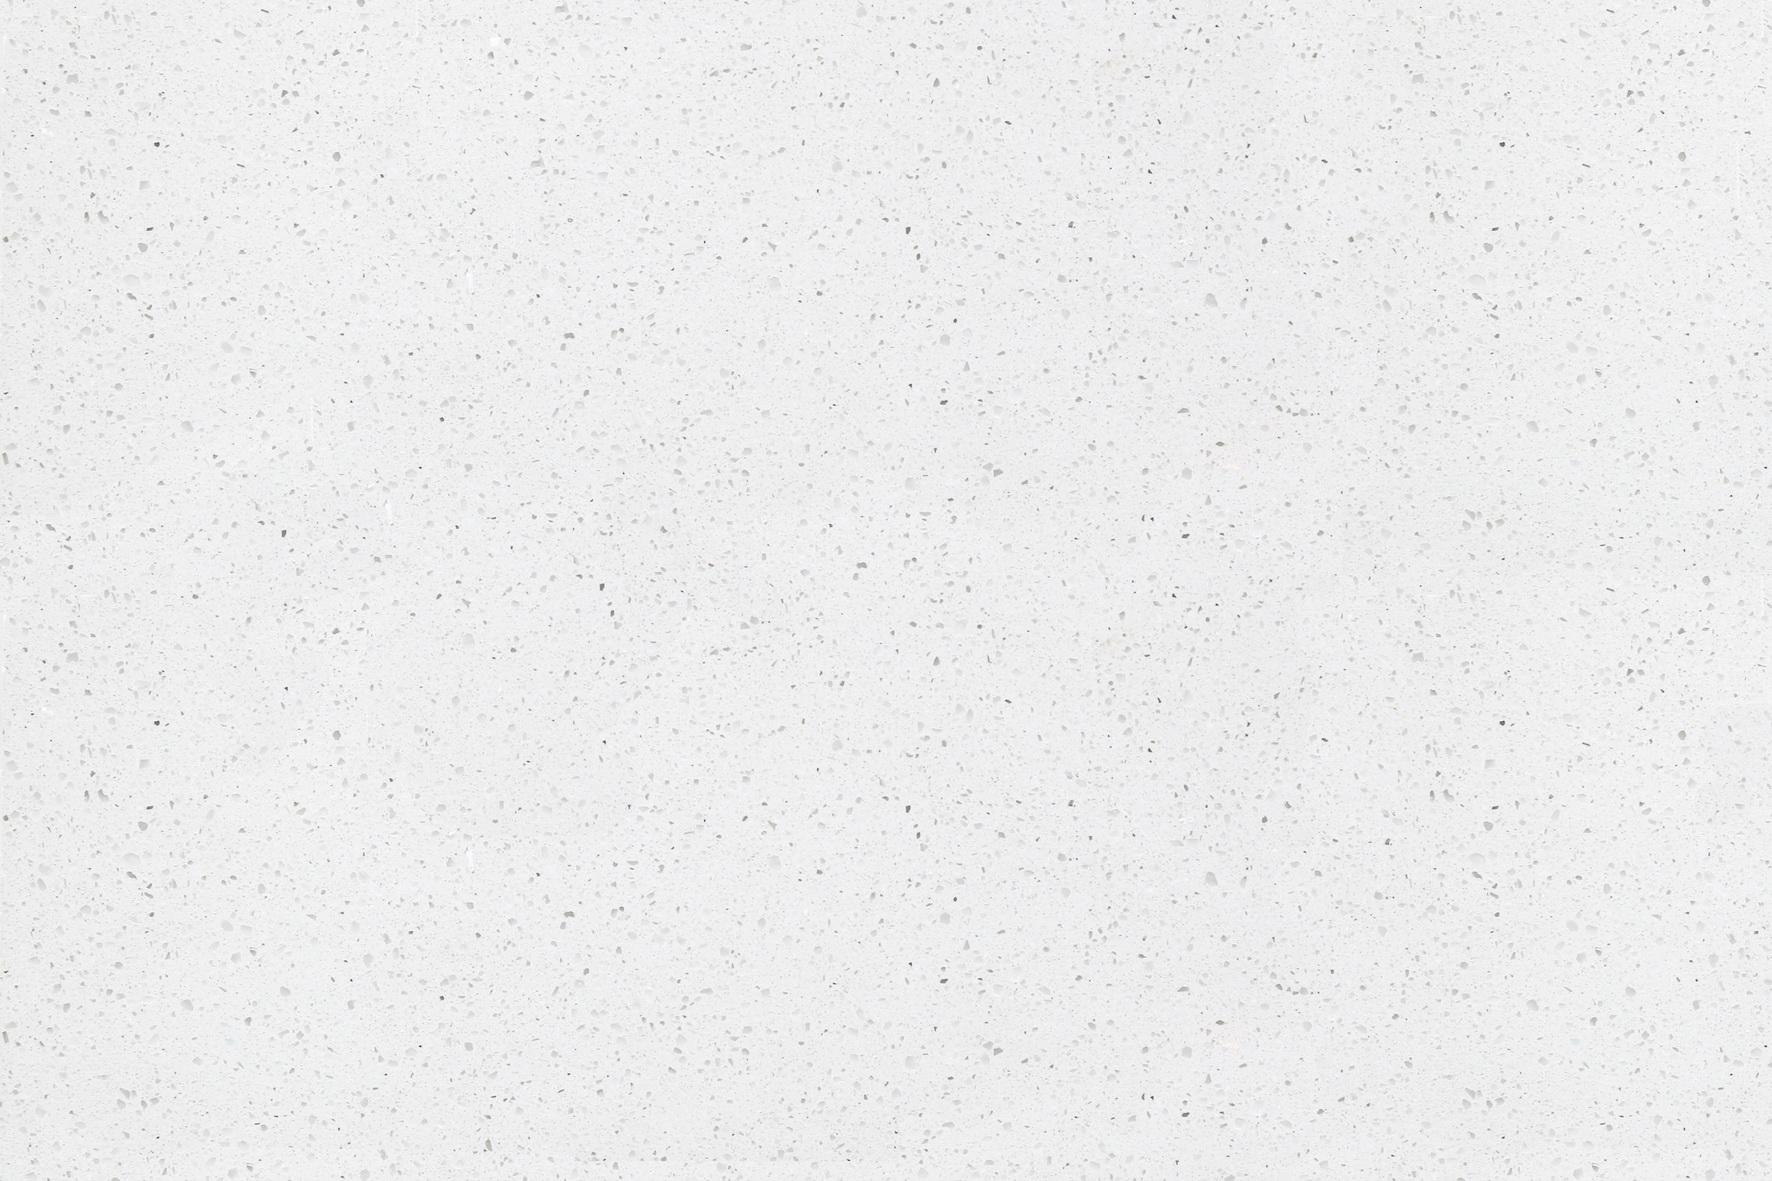 RAINBOW WHITE UNIPLUS UNIPLUS LUCIDE Foto: 1_47174_37640.jpg